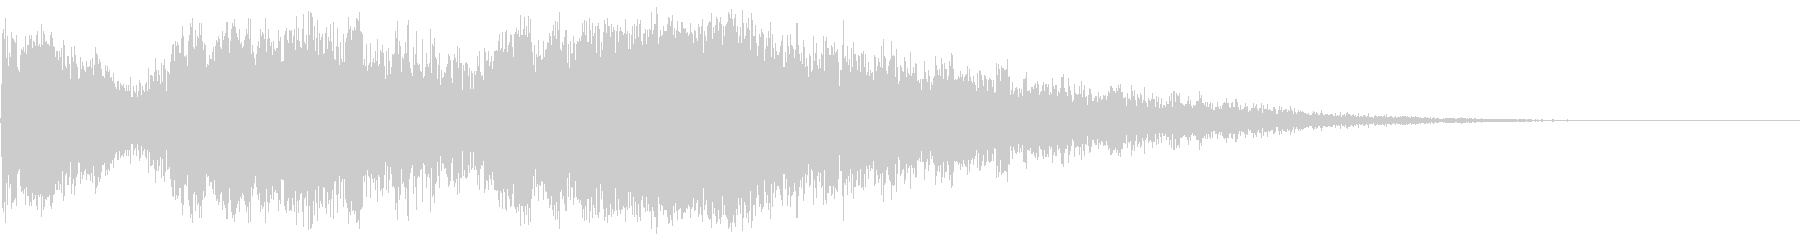 SciFi EC03_97_1の未再生の波形